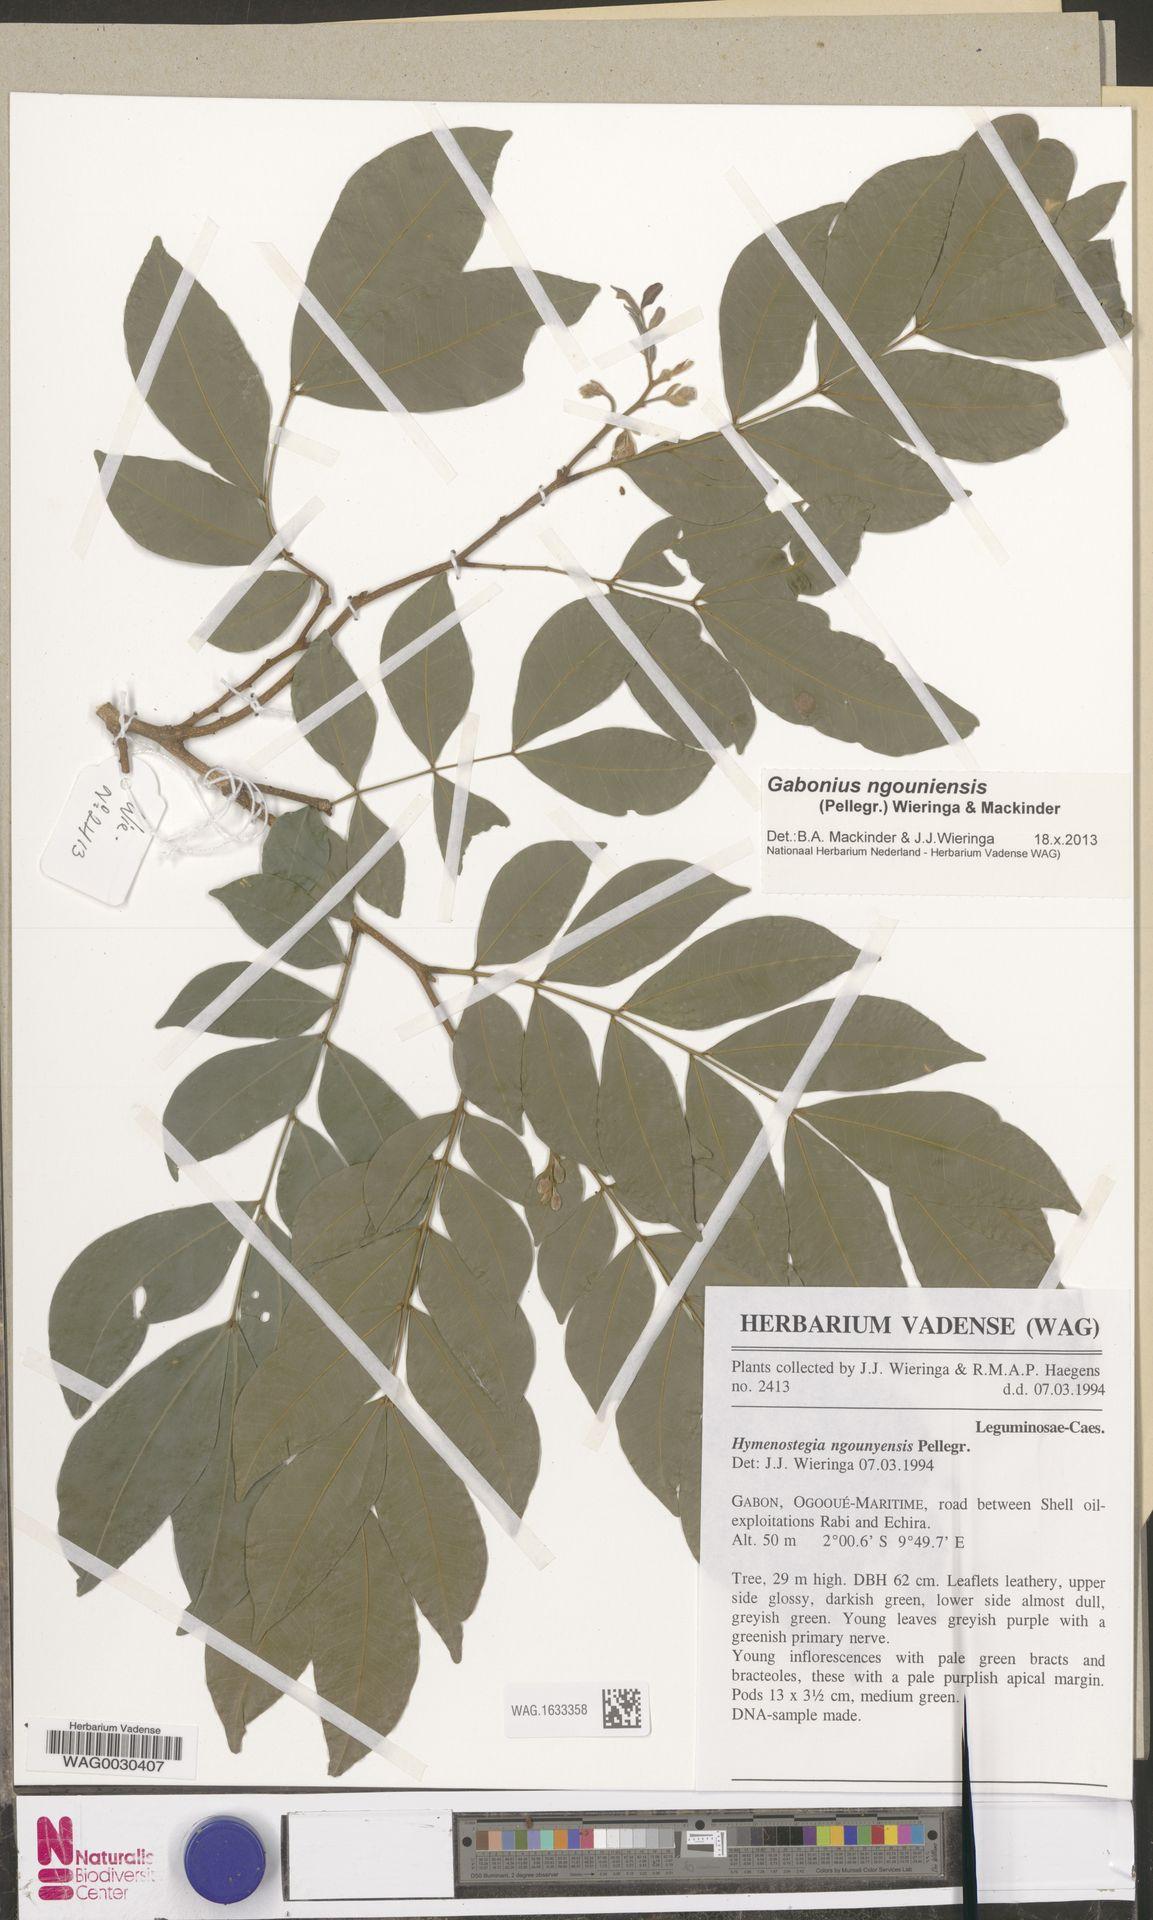 WAG.1633358 | Gabonius ngouniensis (Pellegr.) Wieringa & Mackinder